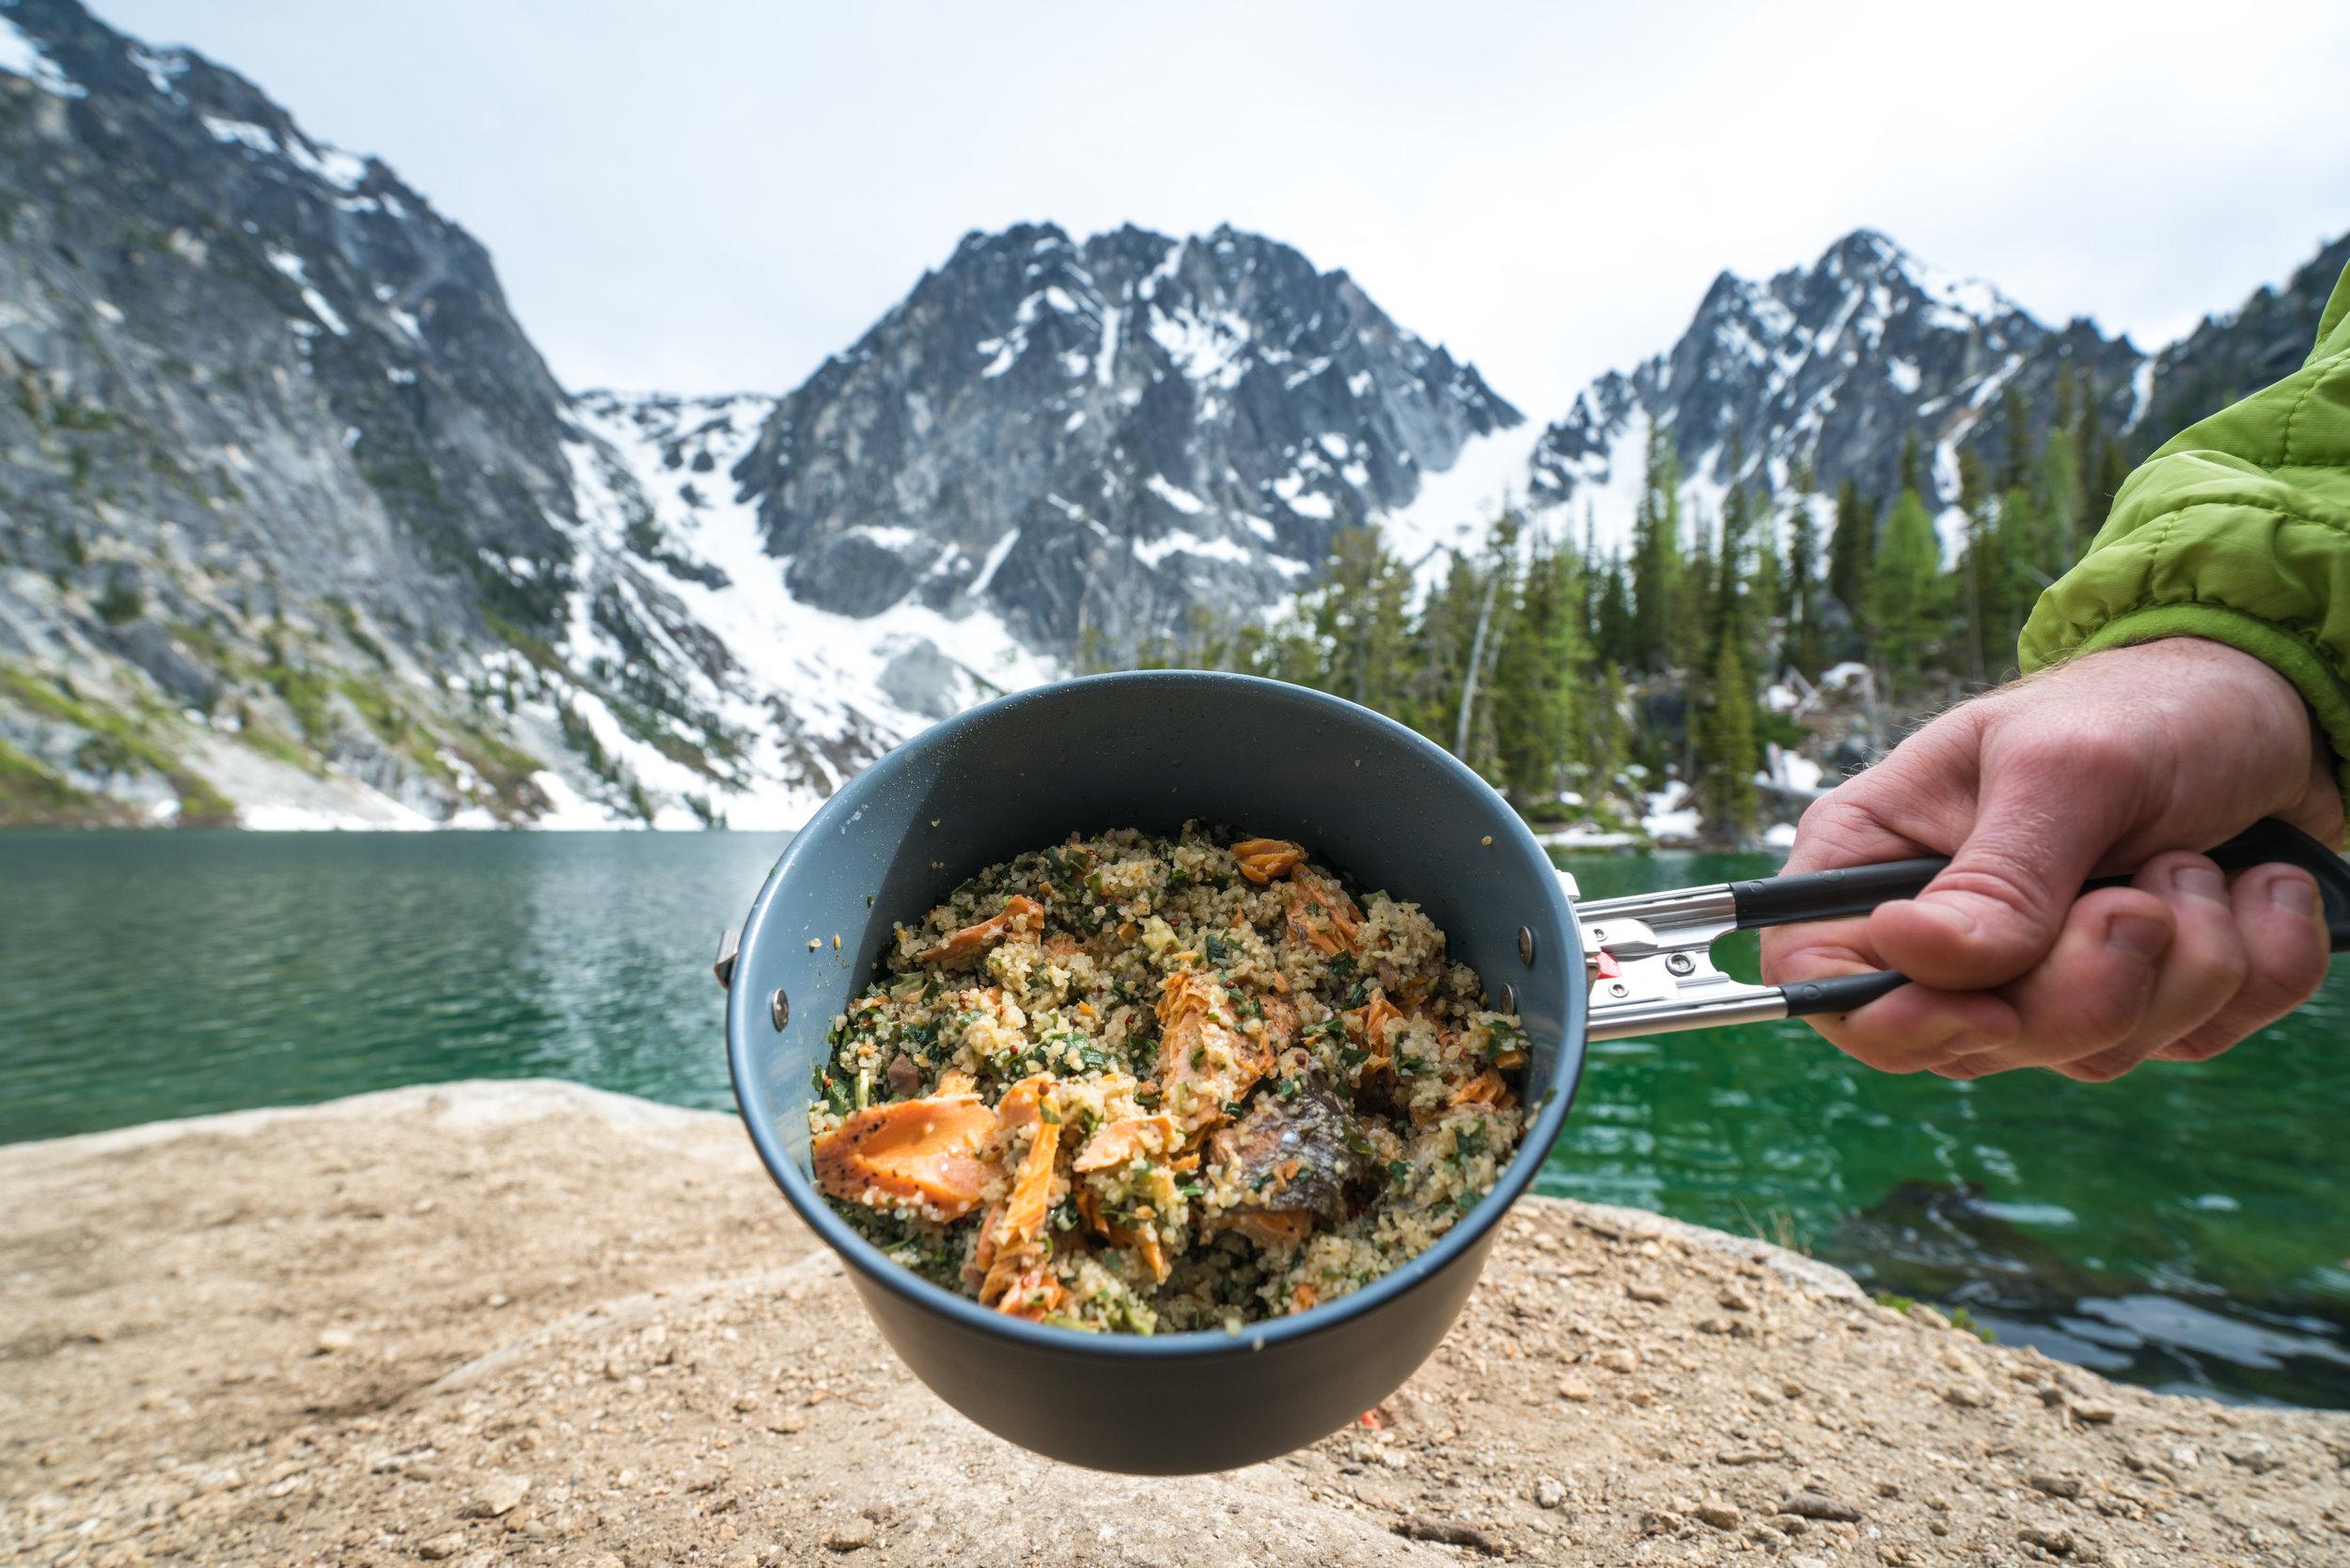 MSR_Gear_Patagonia_provisions_Washington_Lake_colchuck_cooking